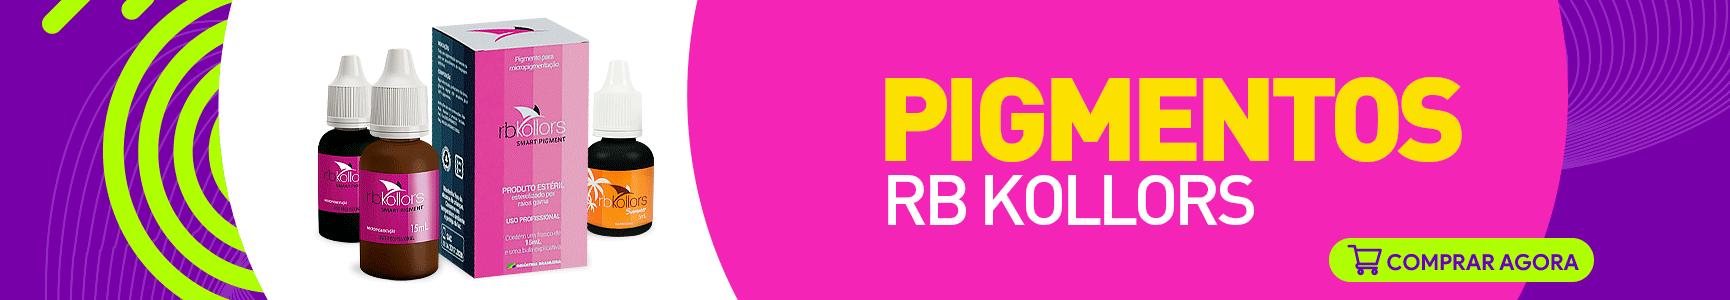 pigmentos rb kollors